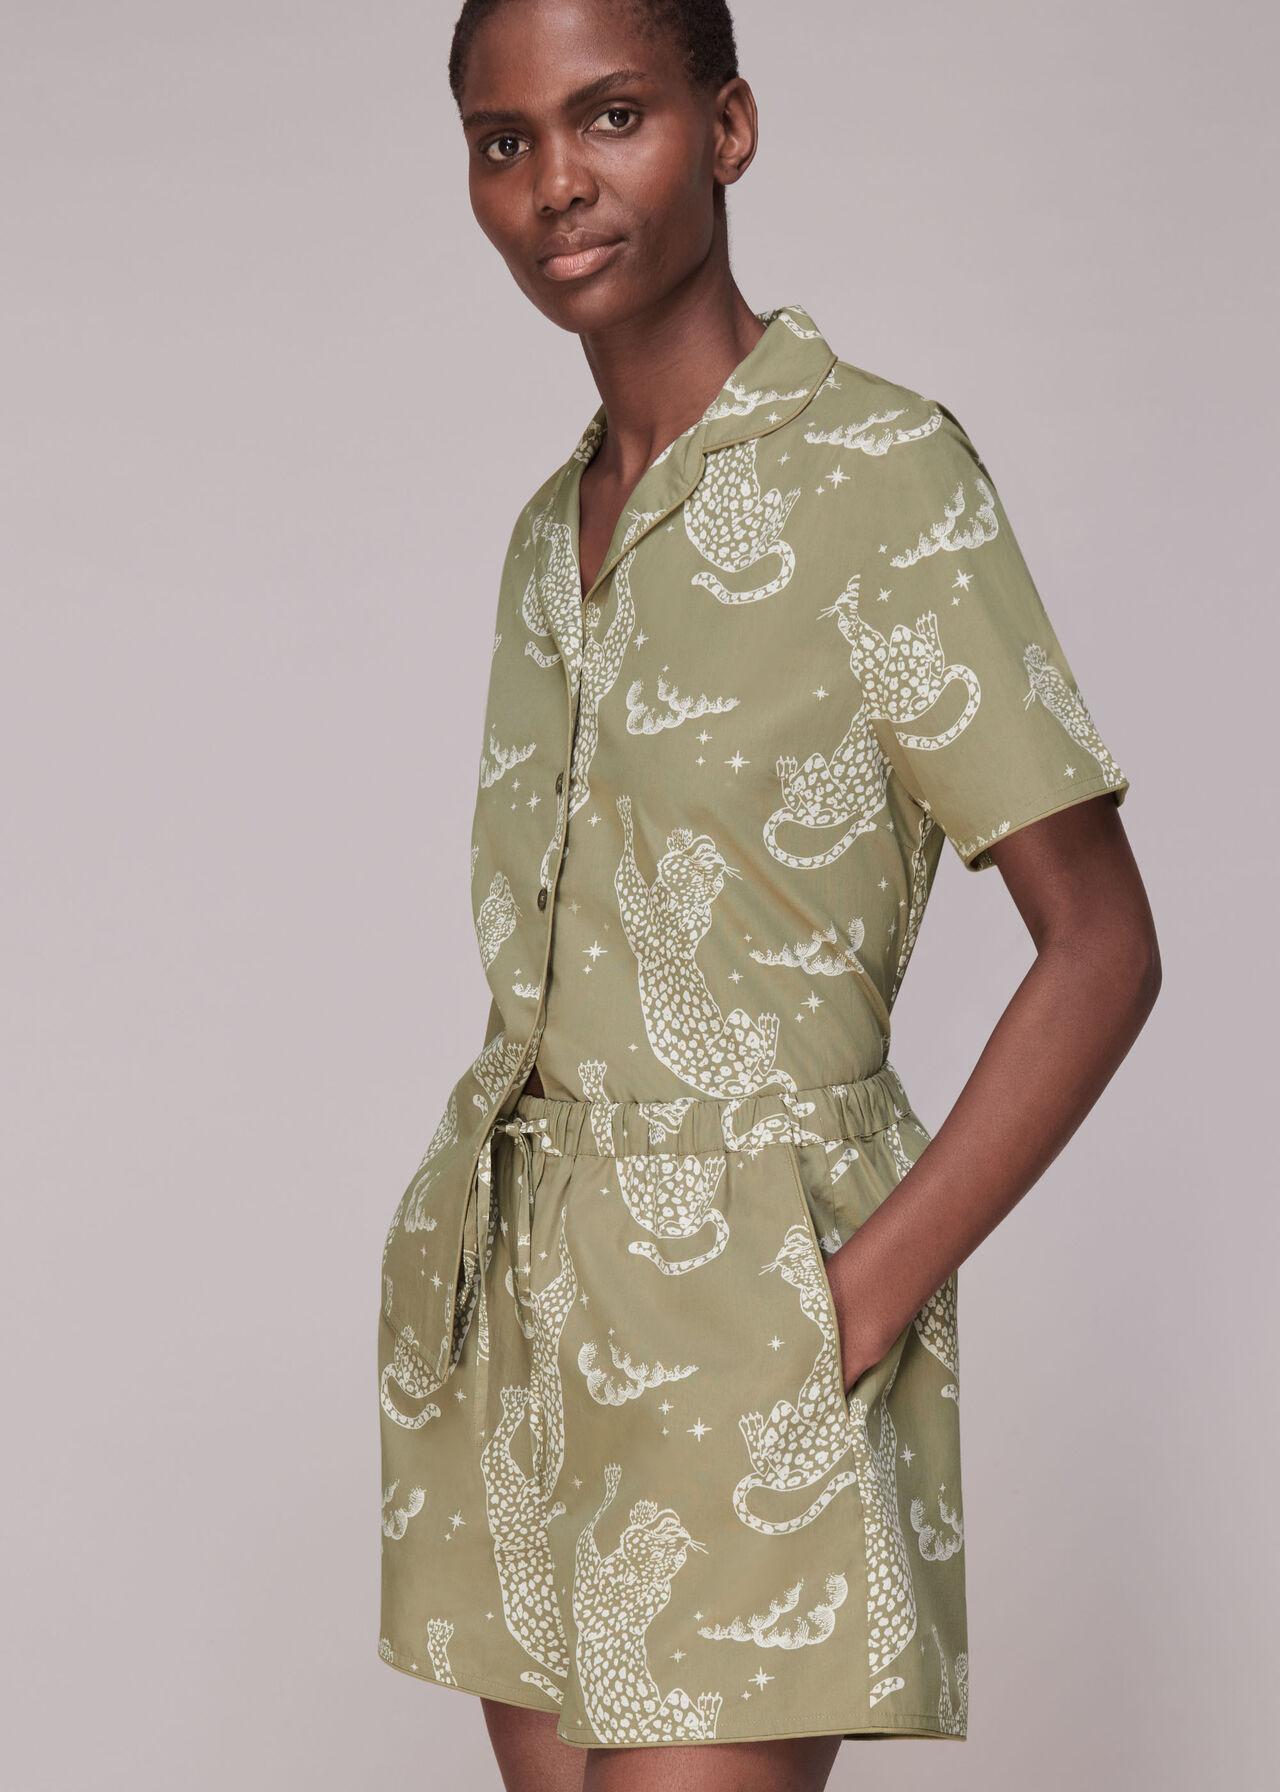 Starred Leopard Pyjamas